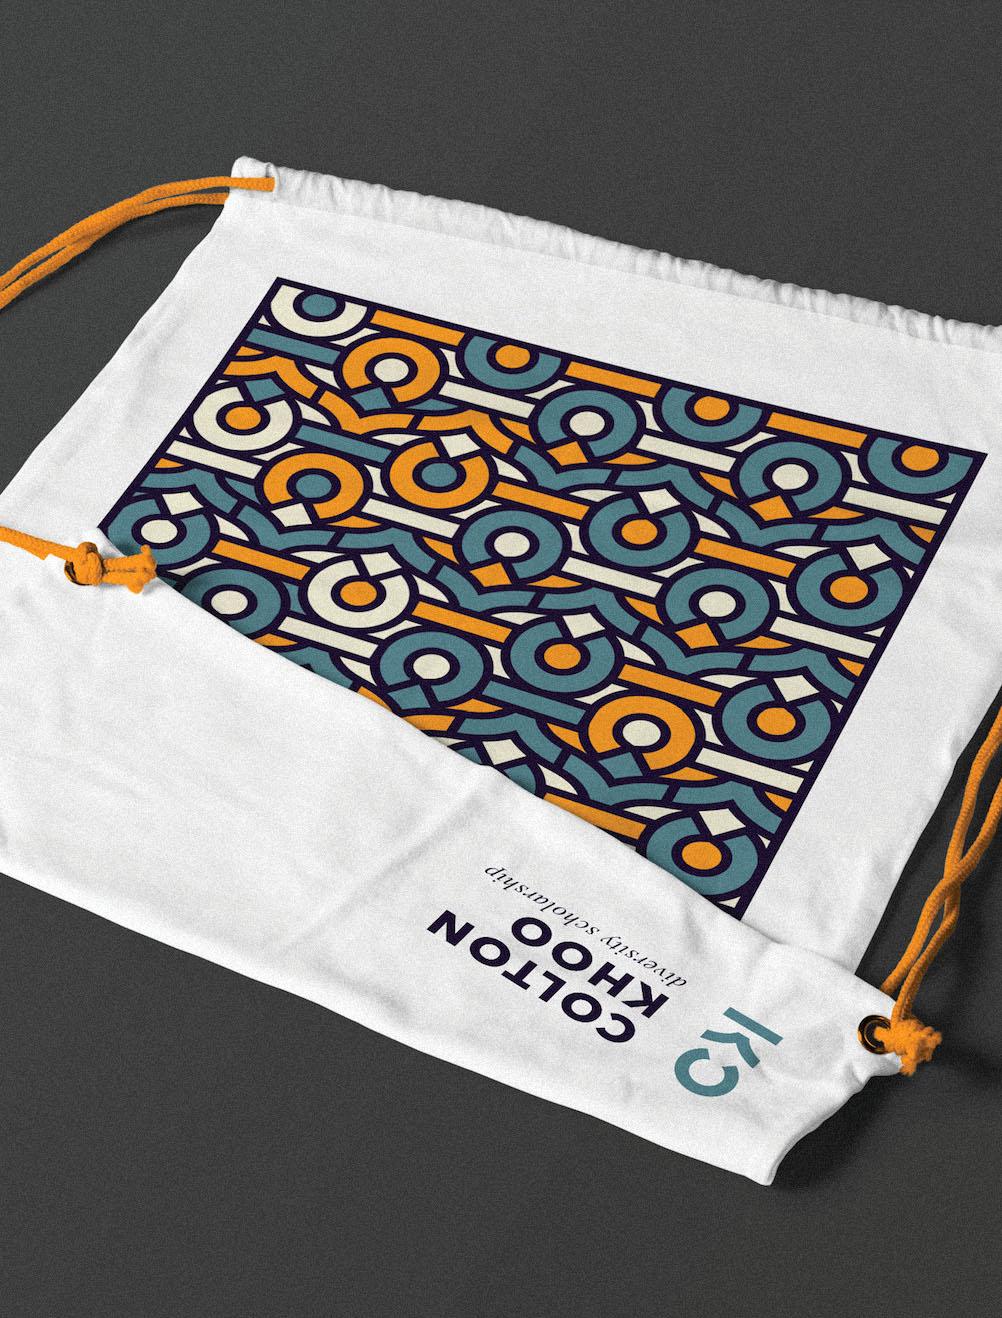 Colton Khoo Diversity Scholarship Branding